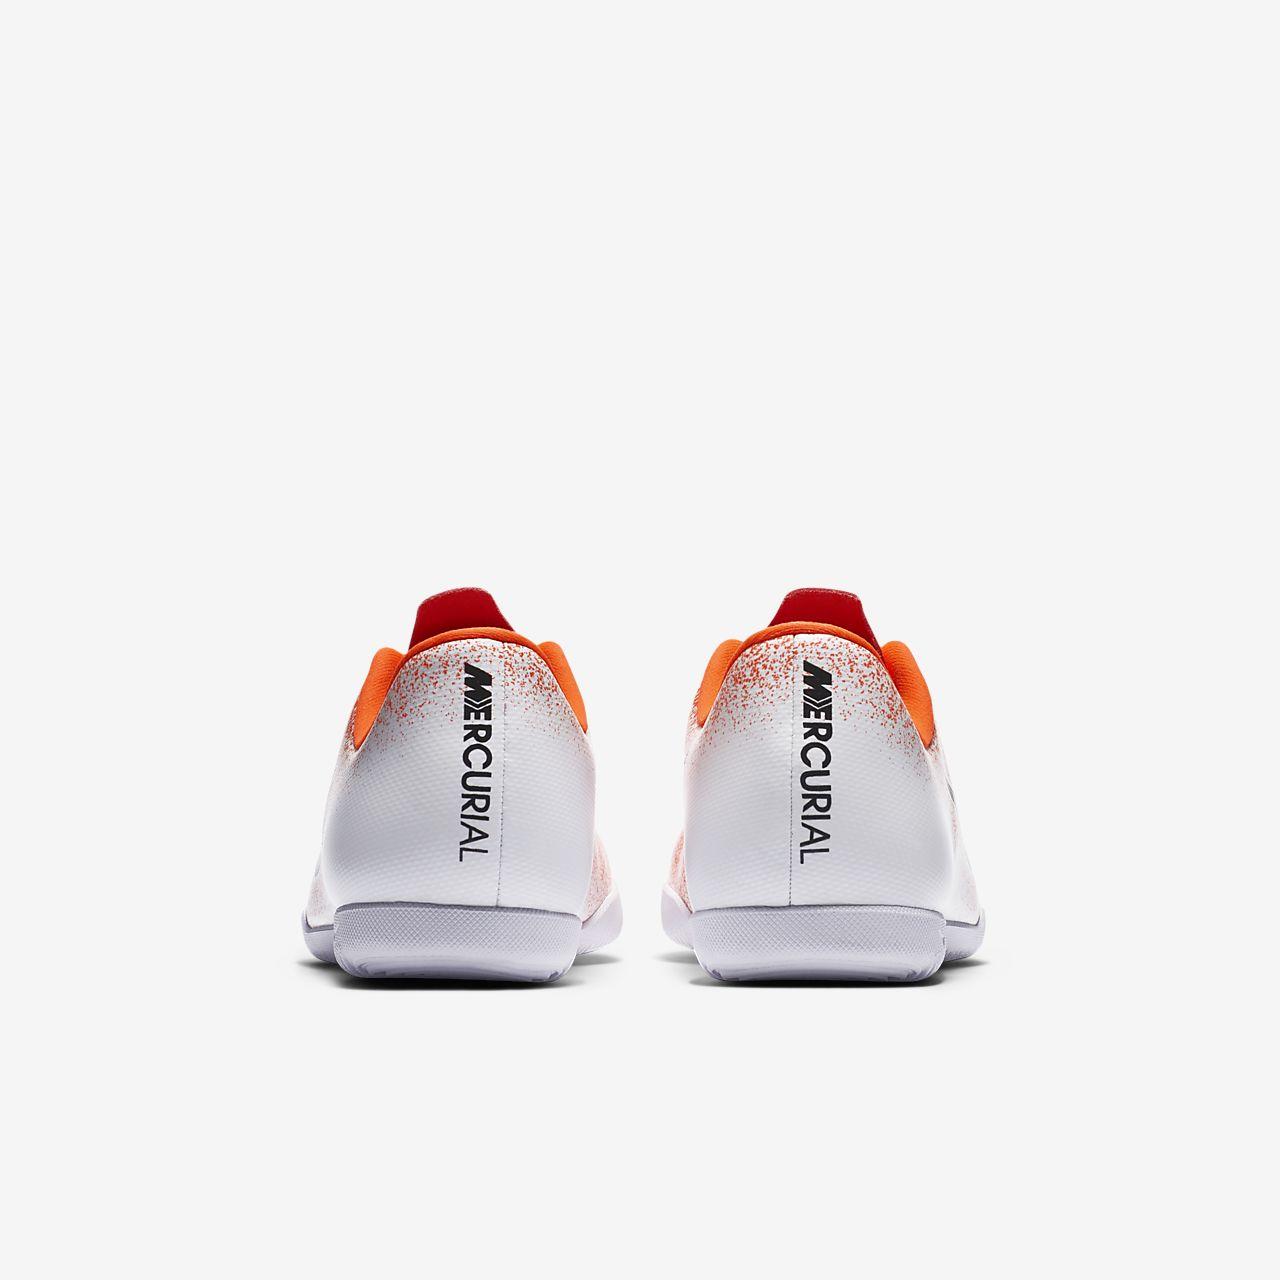 5588bb208371 ... Nike Jr. MercurialX Vapor XII Club IC Younger/Older Kids' Indoor/Court